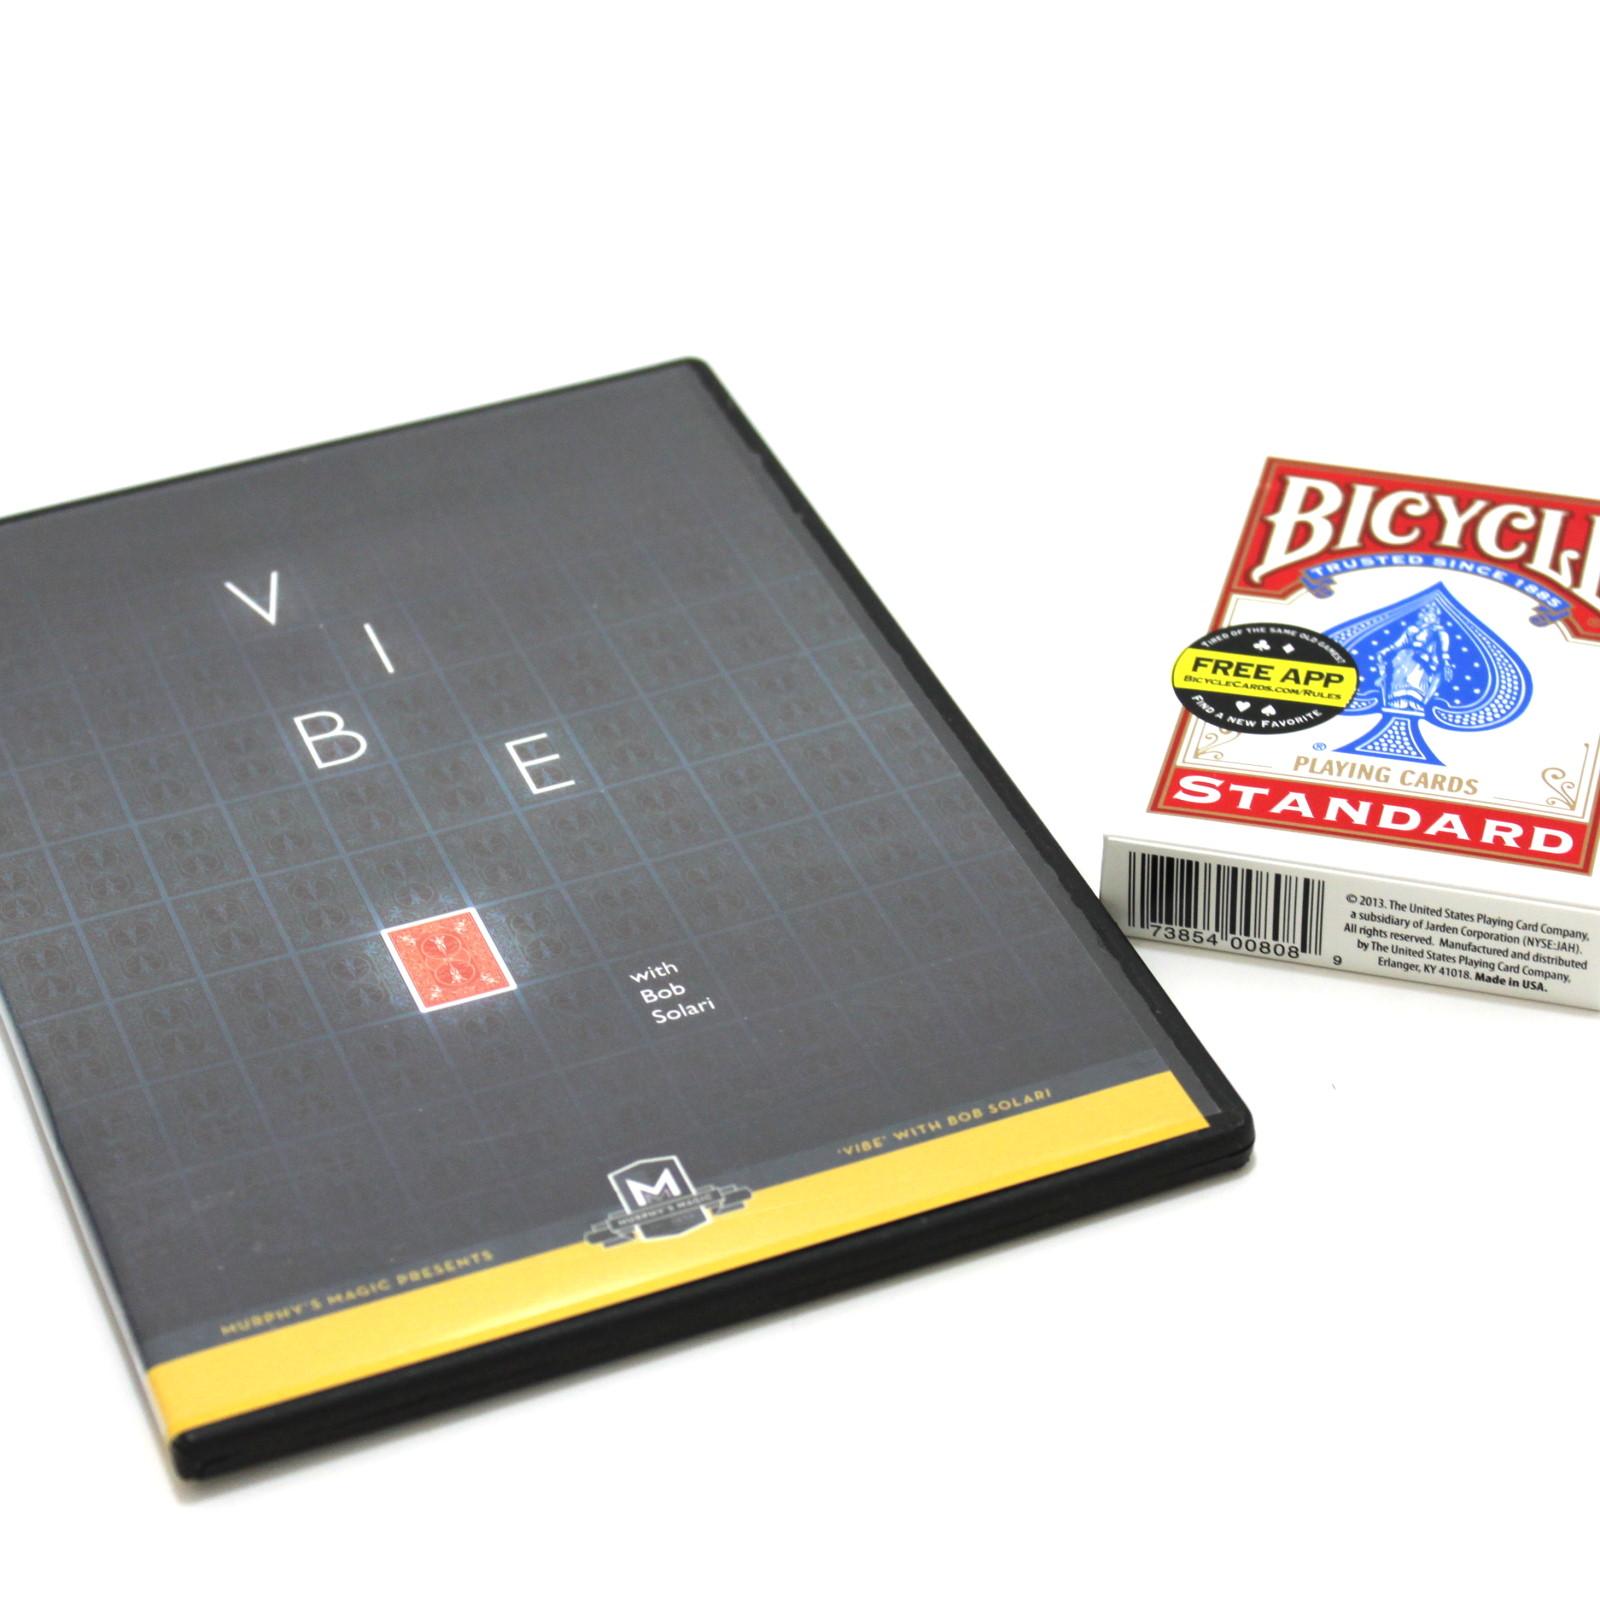 VIBE + Deck by Bob Solari Magic